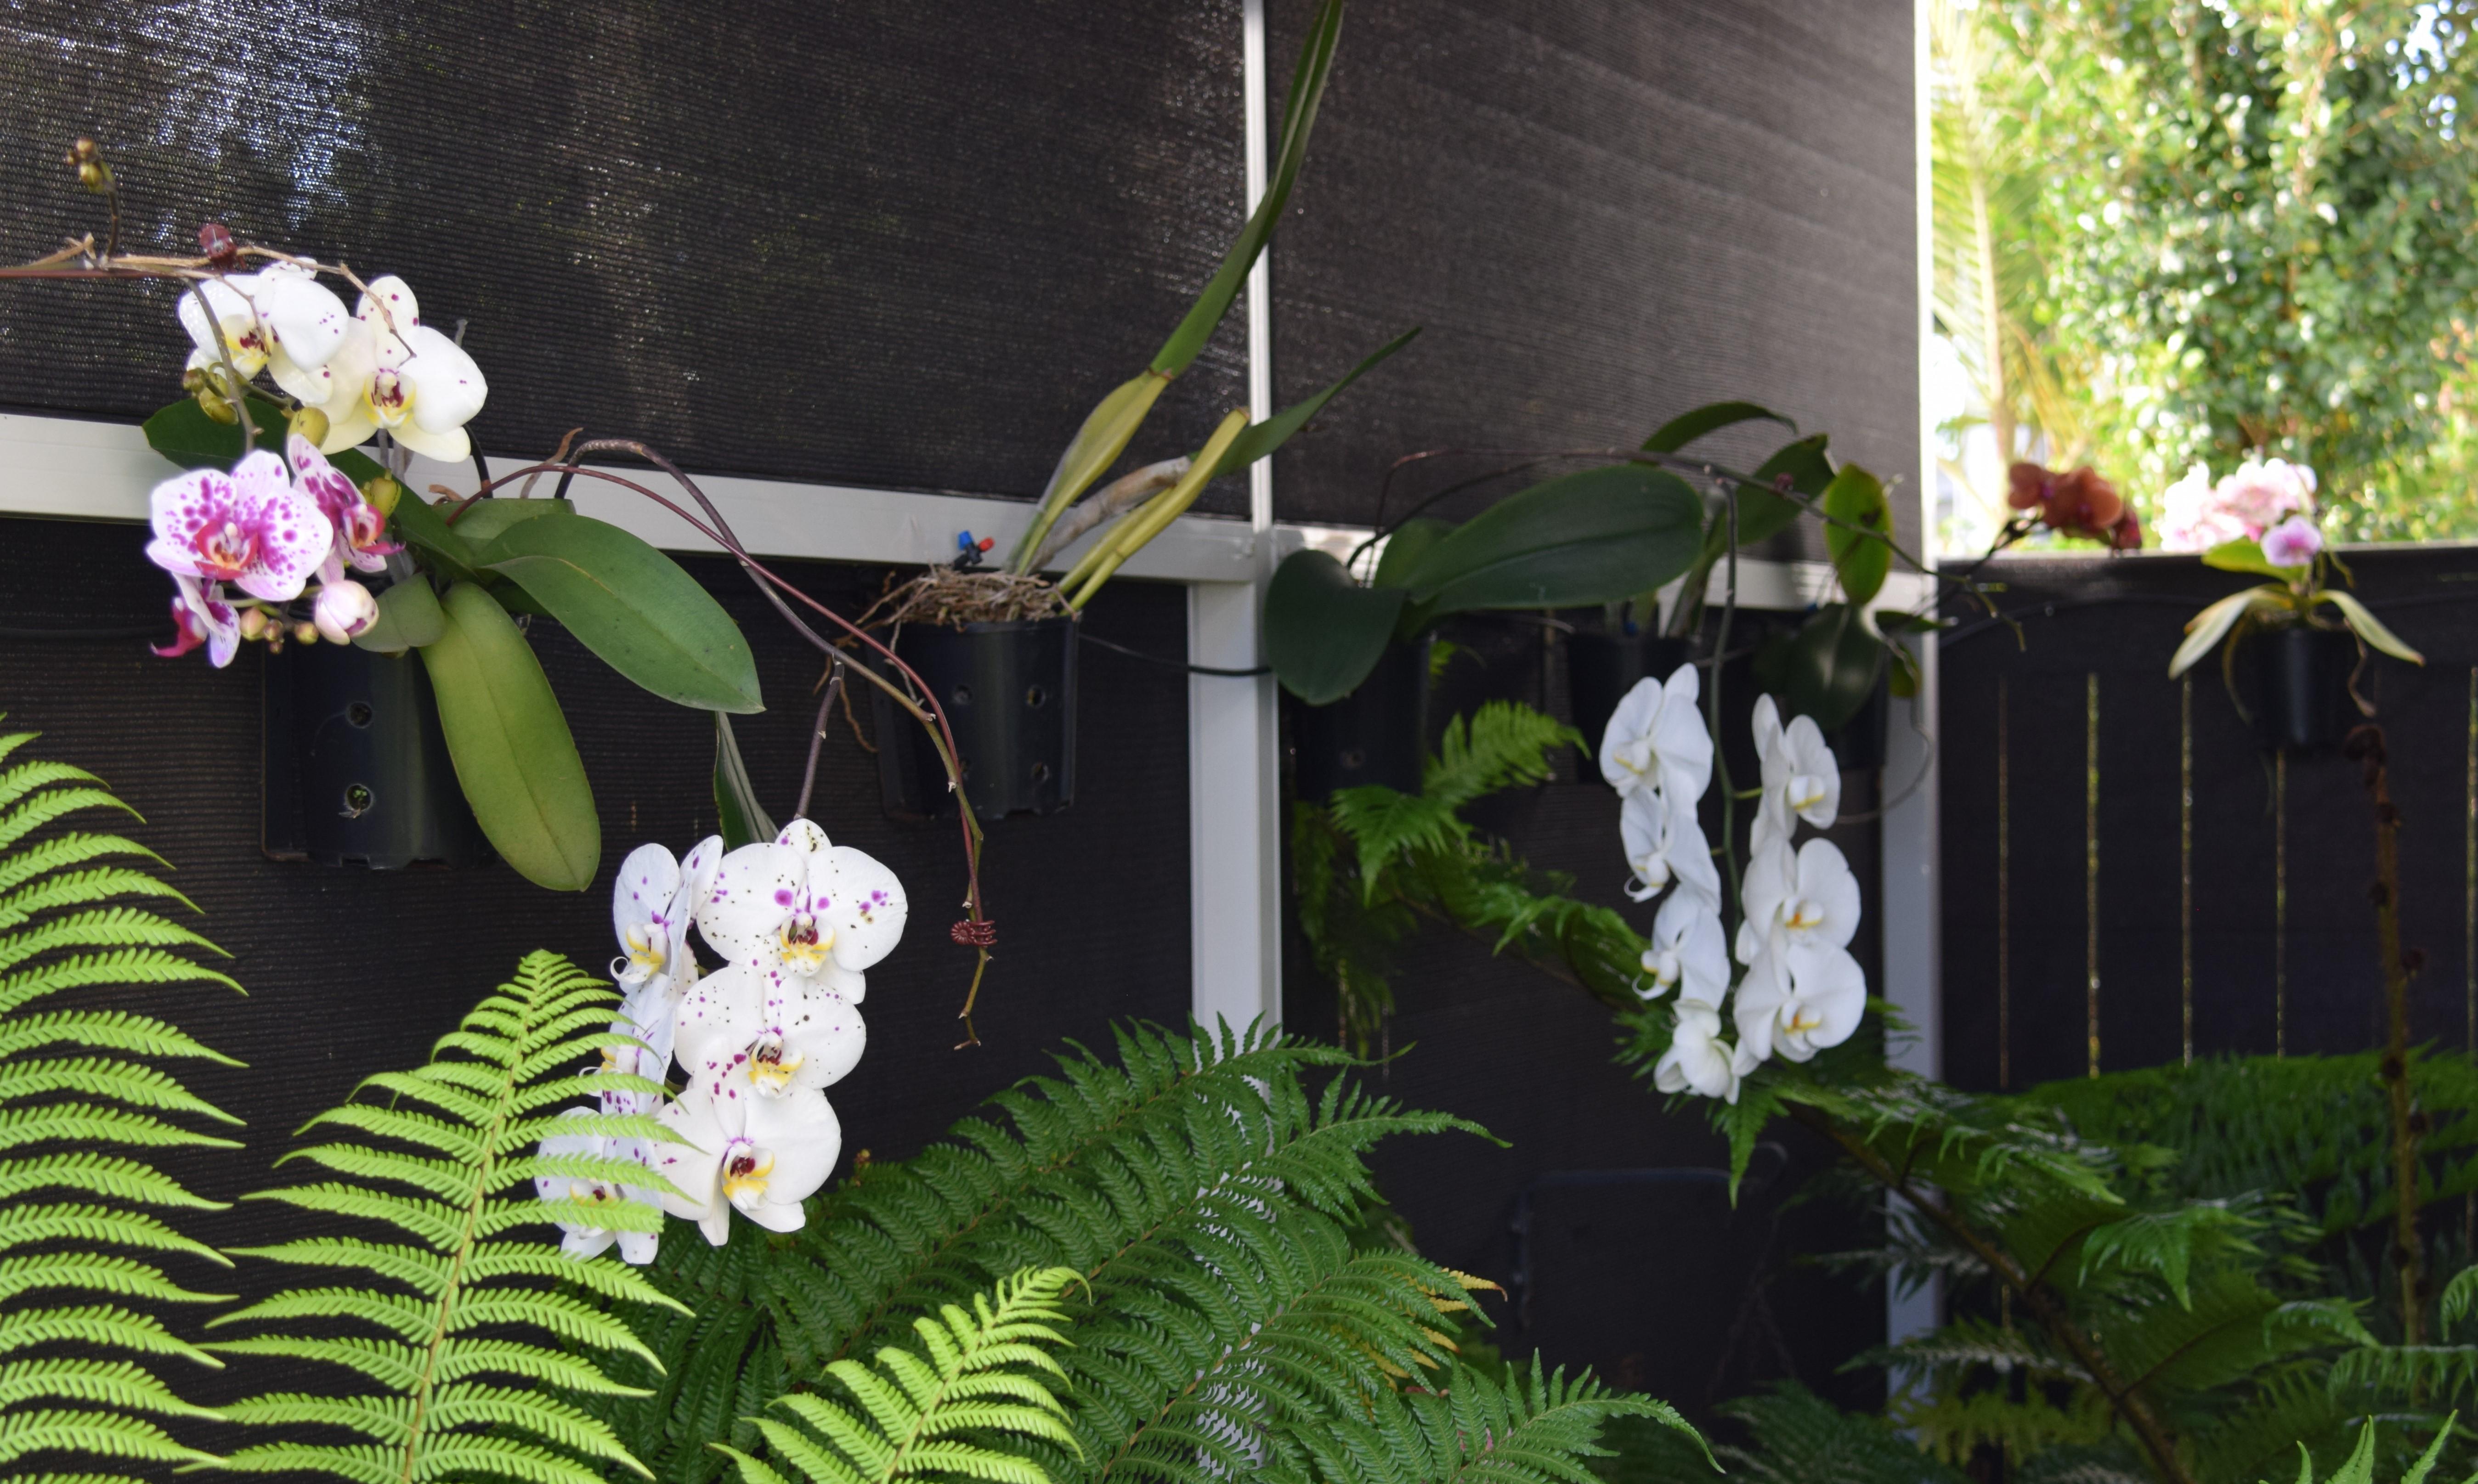 20201015 DSC 0781 Orchids 2 - 1/1 Latitude Blvd